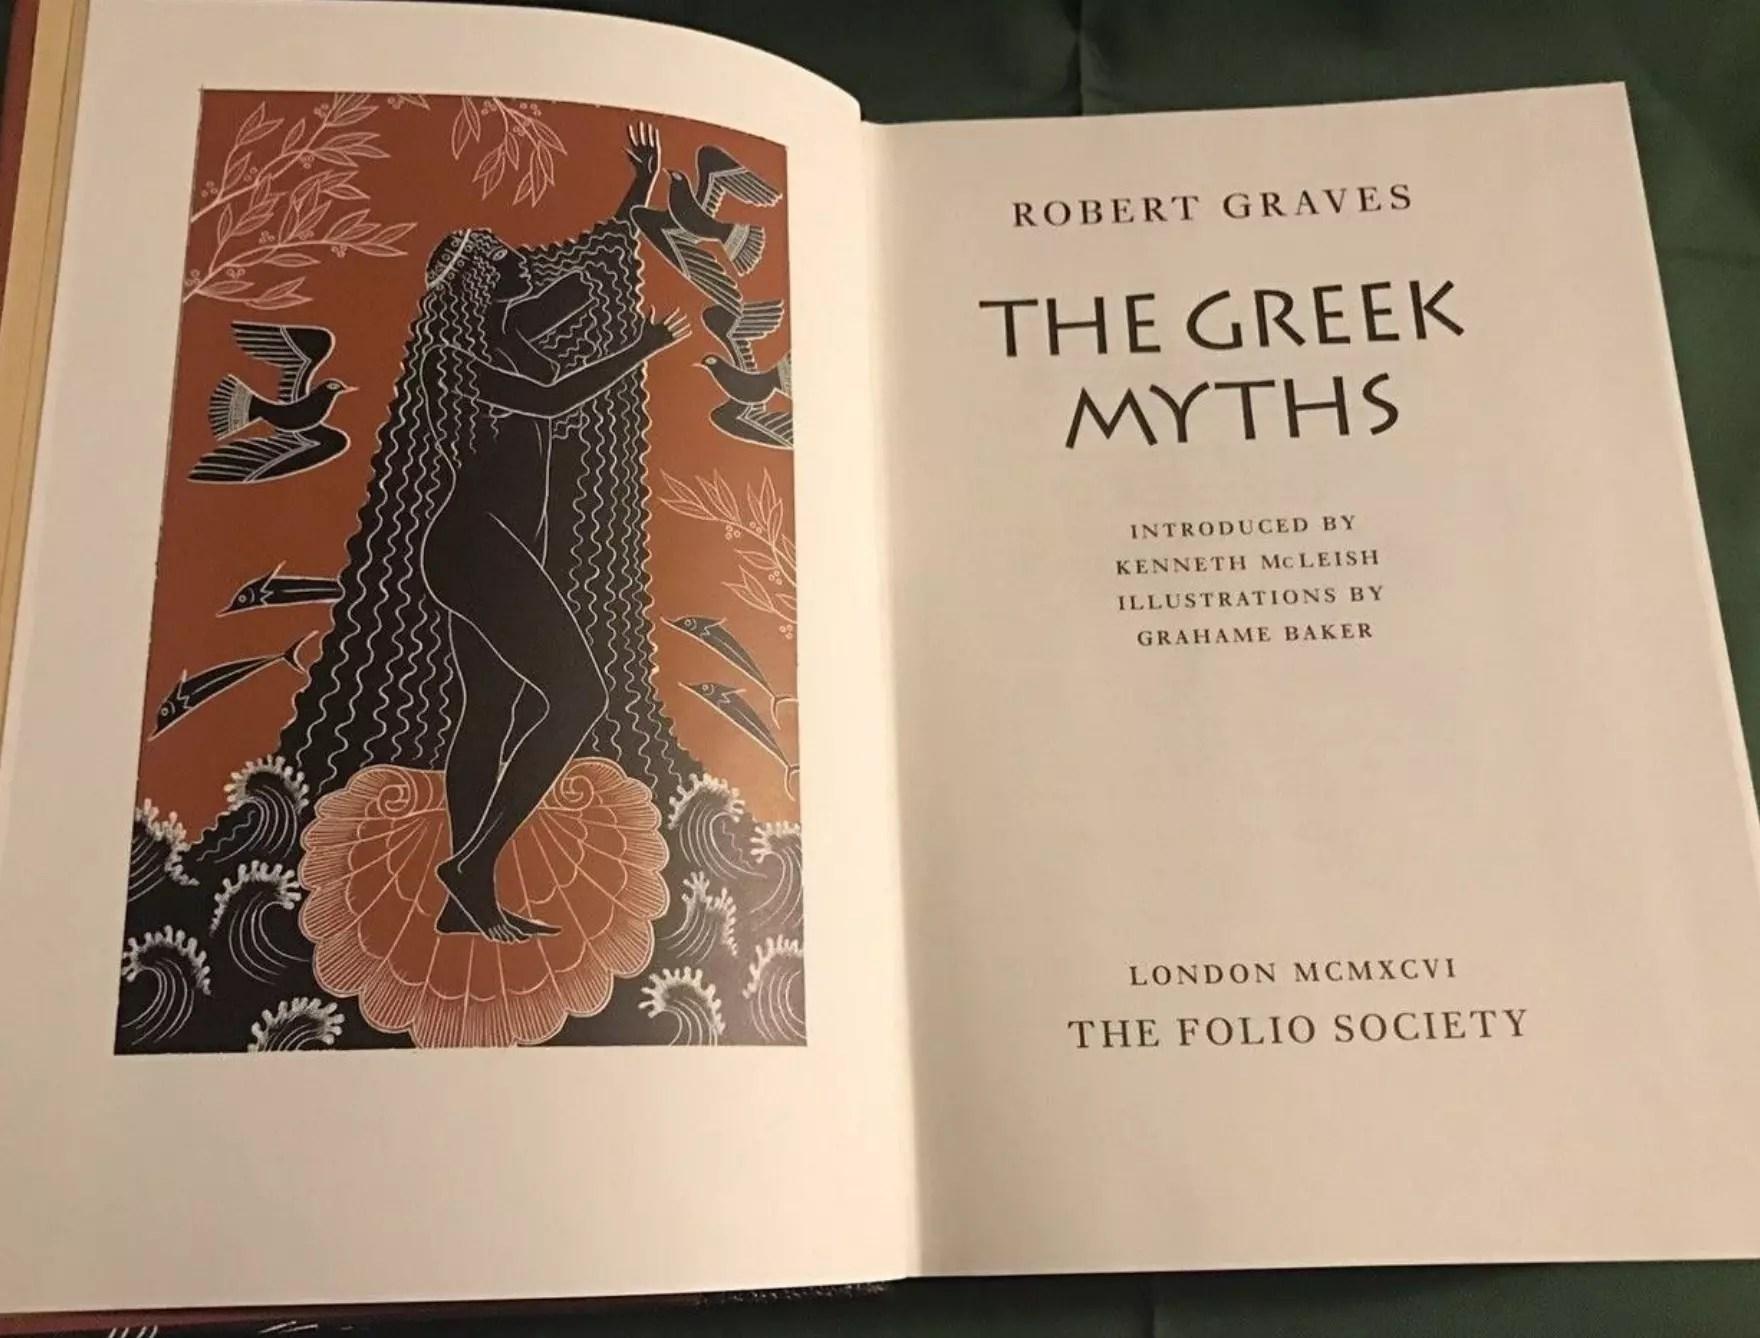 Illustration from FS Greek Myths – beautifulbooks.info